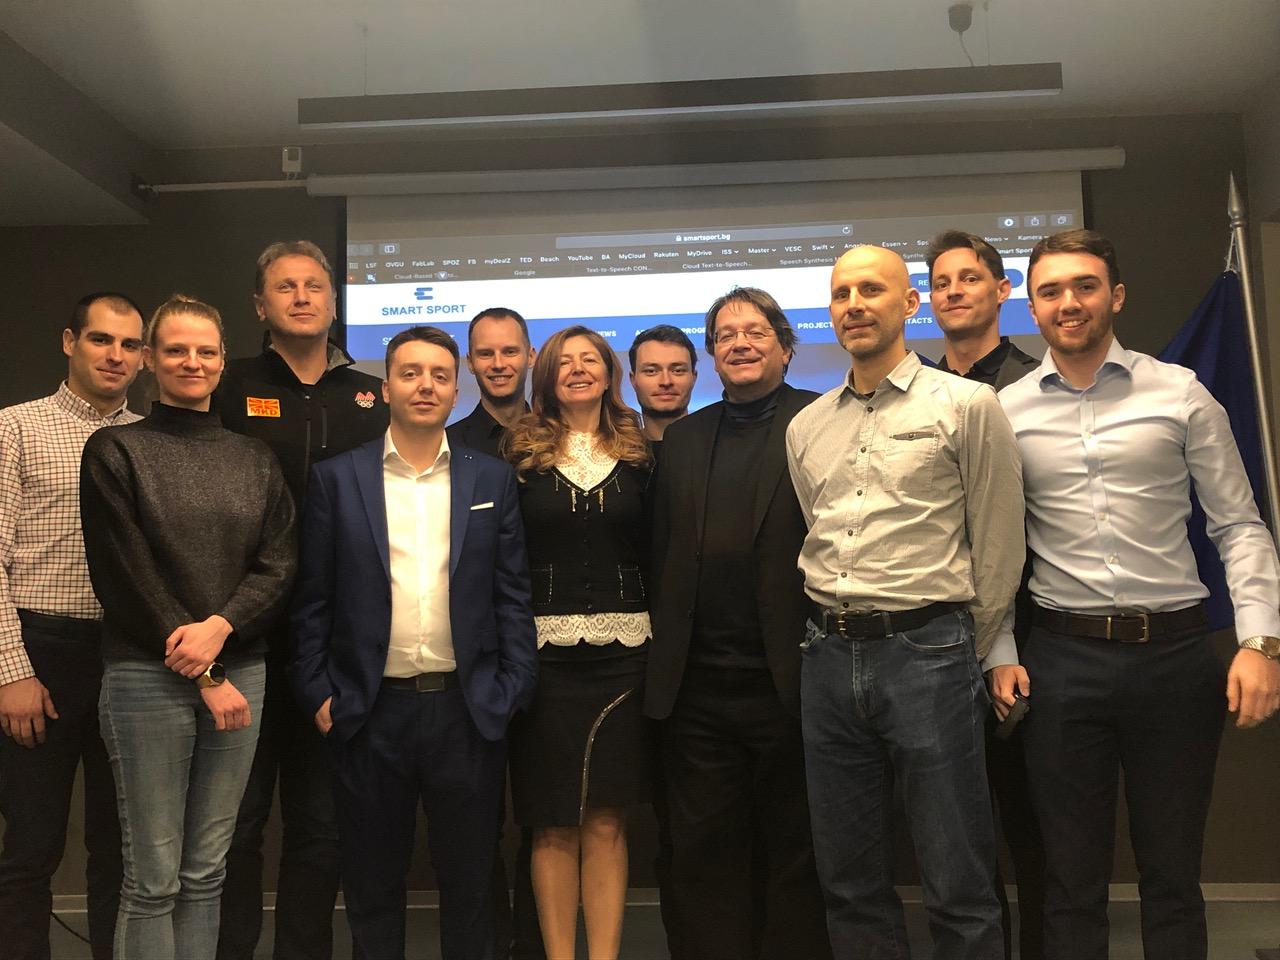 Smart sport partners representatives at the Skopje meeting